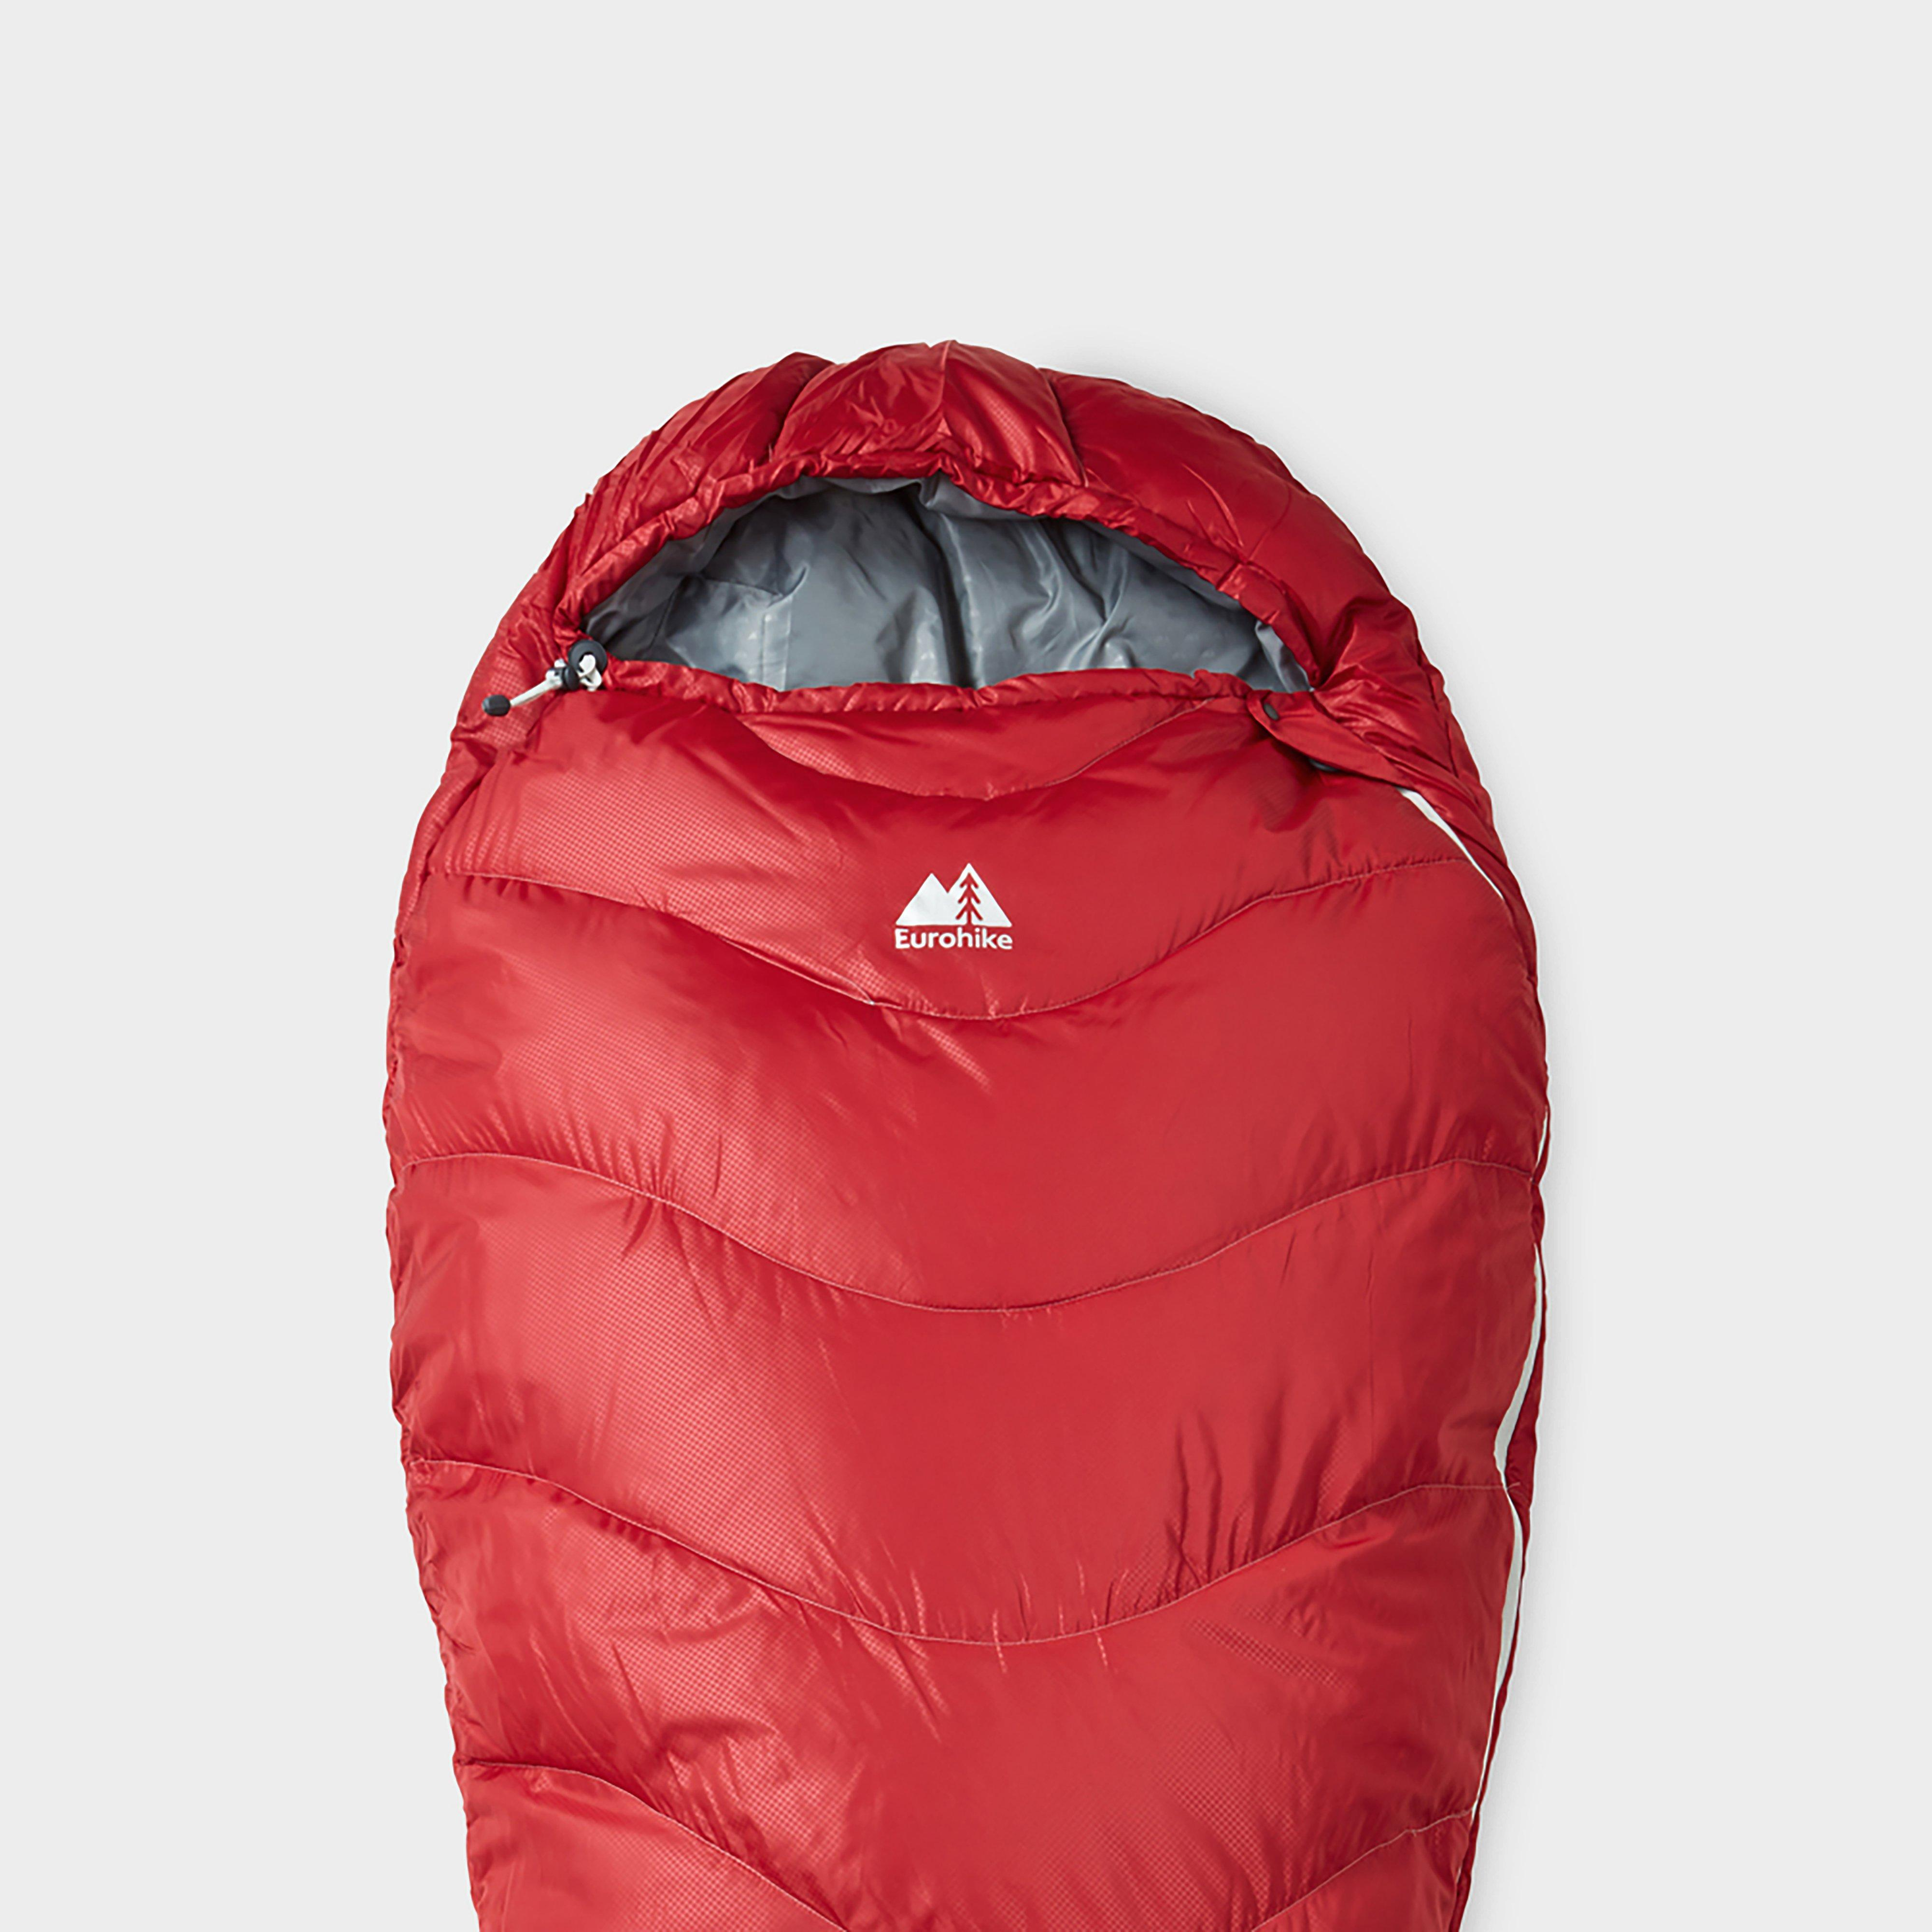 Eurohike Eurohike Adventurer 200 Sleeping Bag - Red, Red